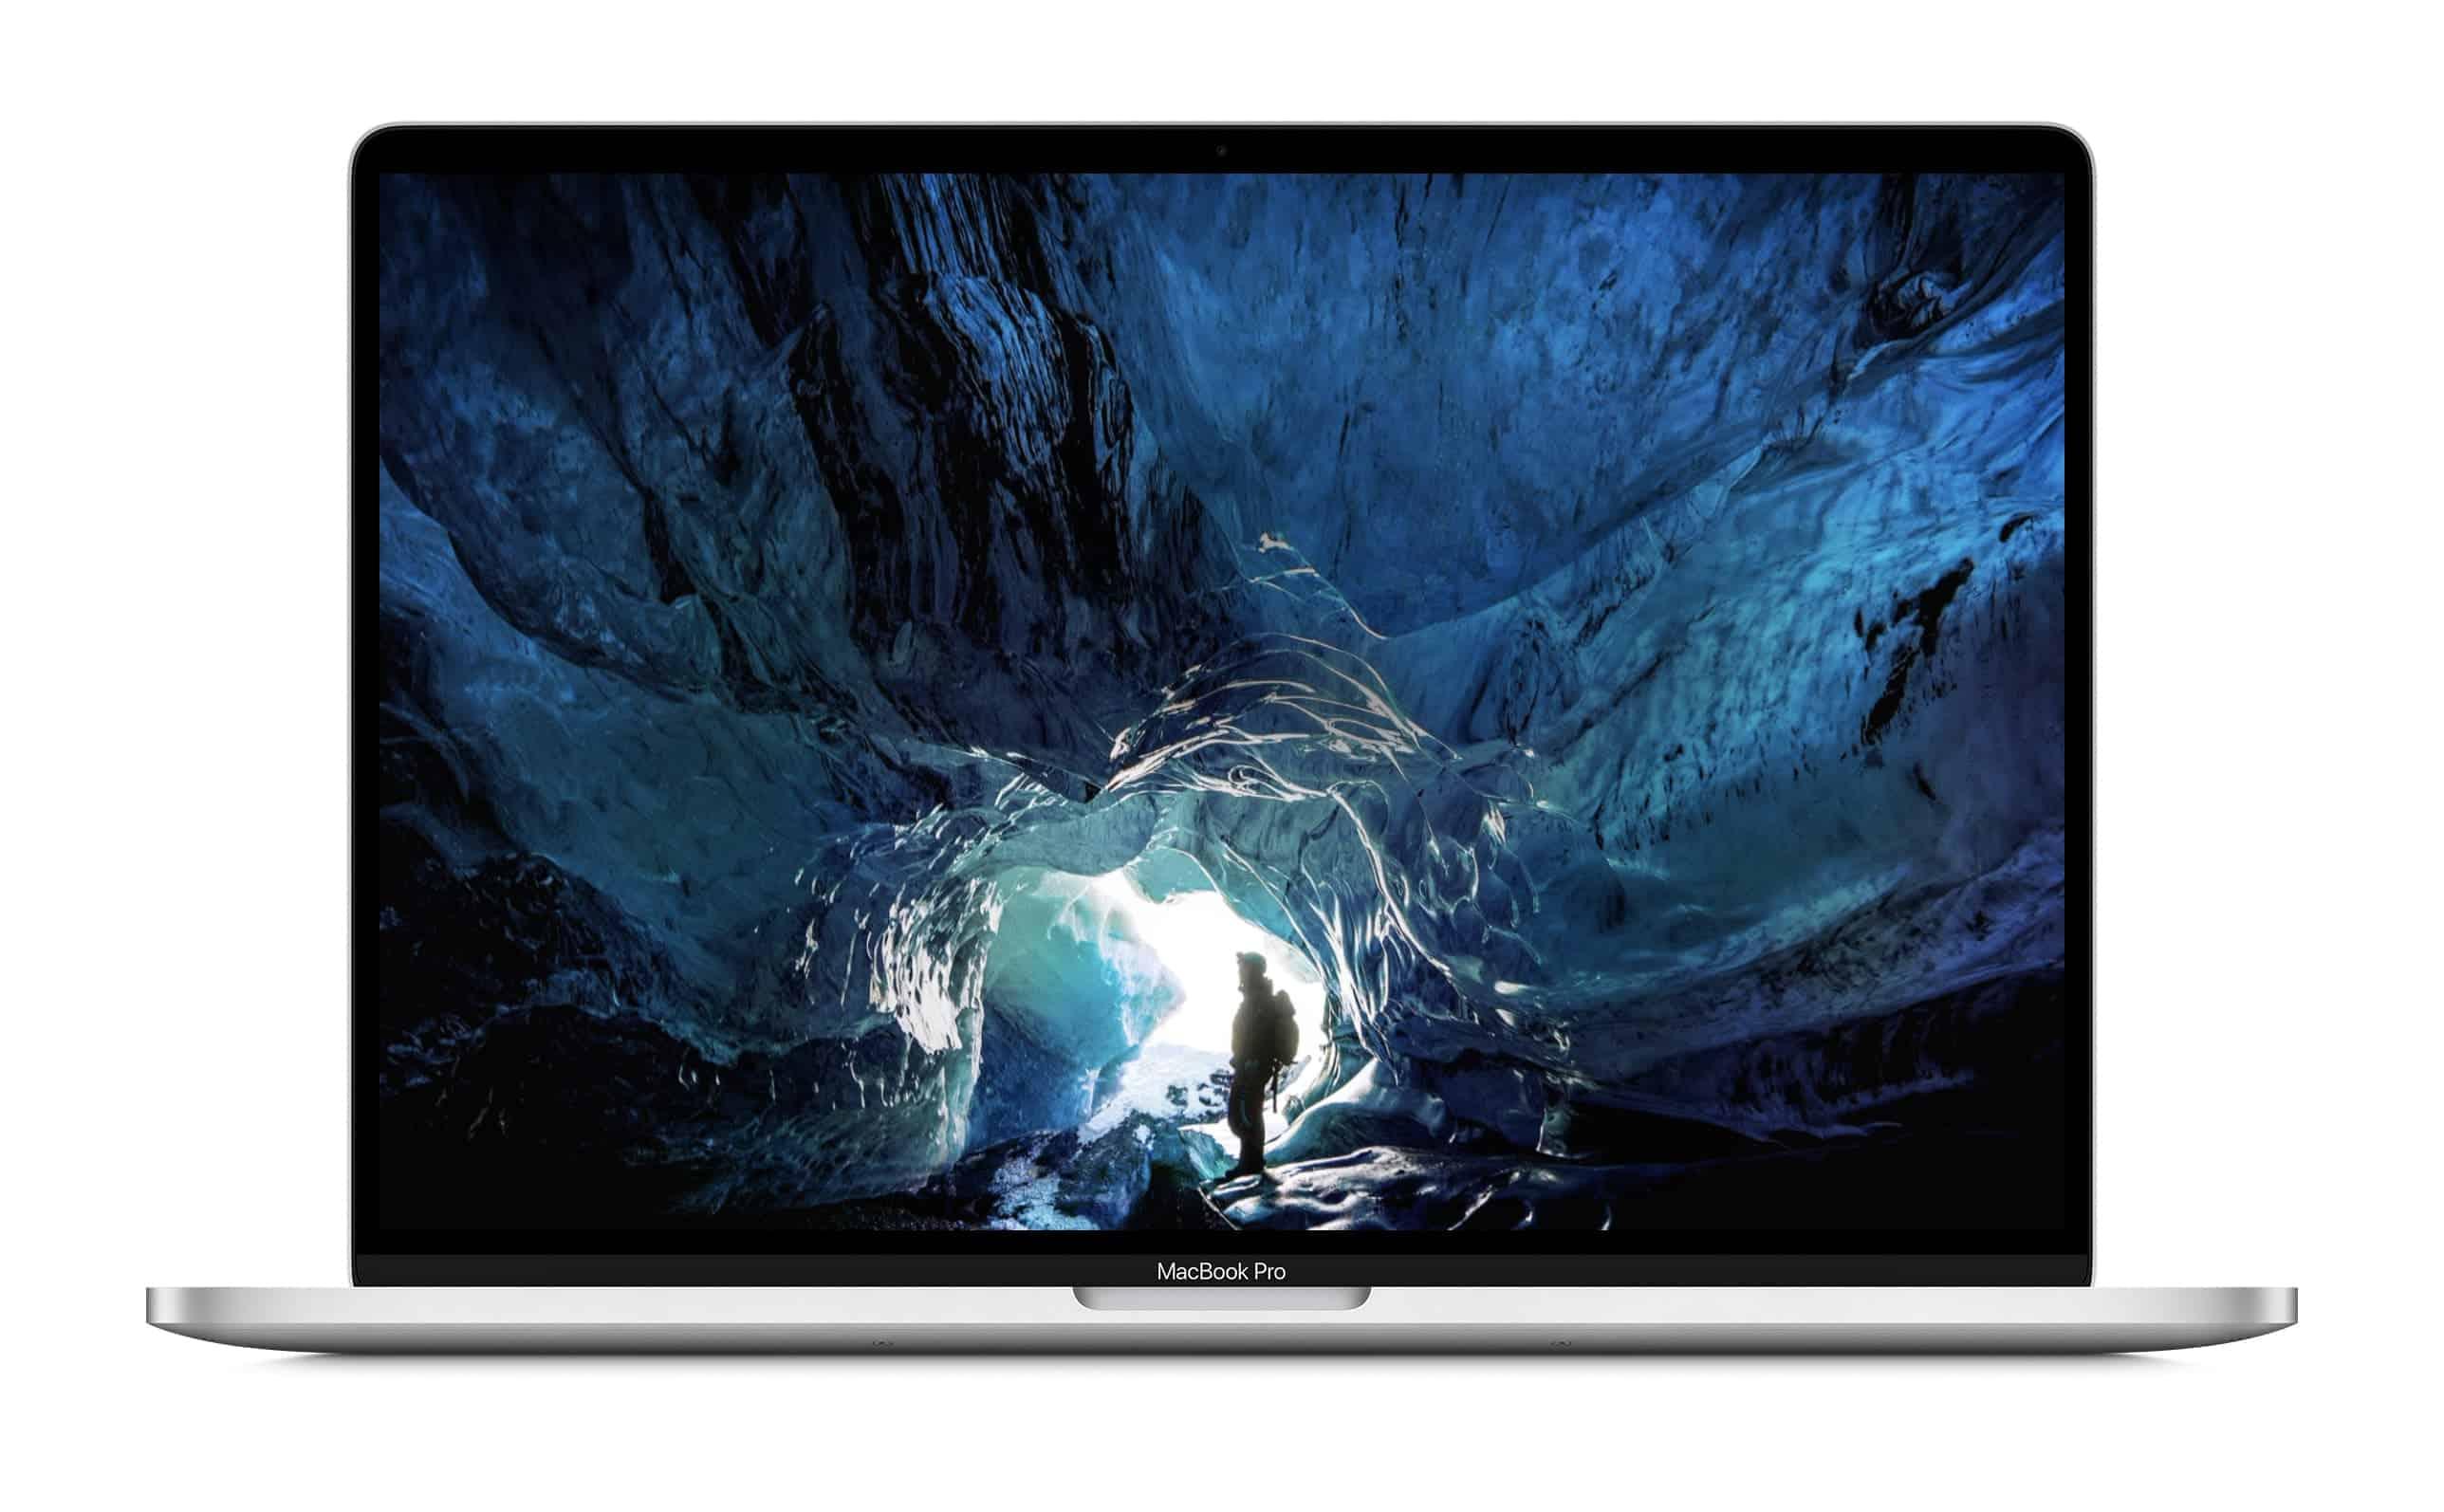 laptopvang-macbook-pro-2019-16-inch-mvvk2